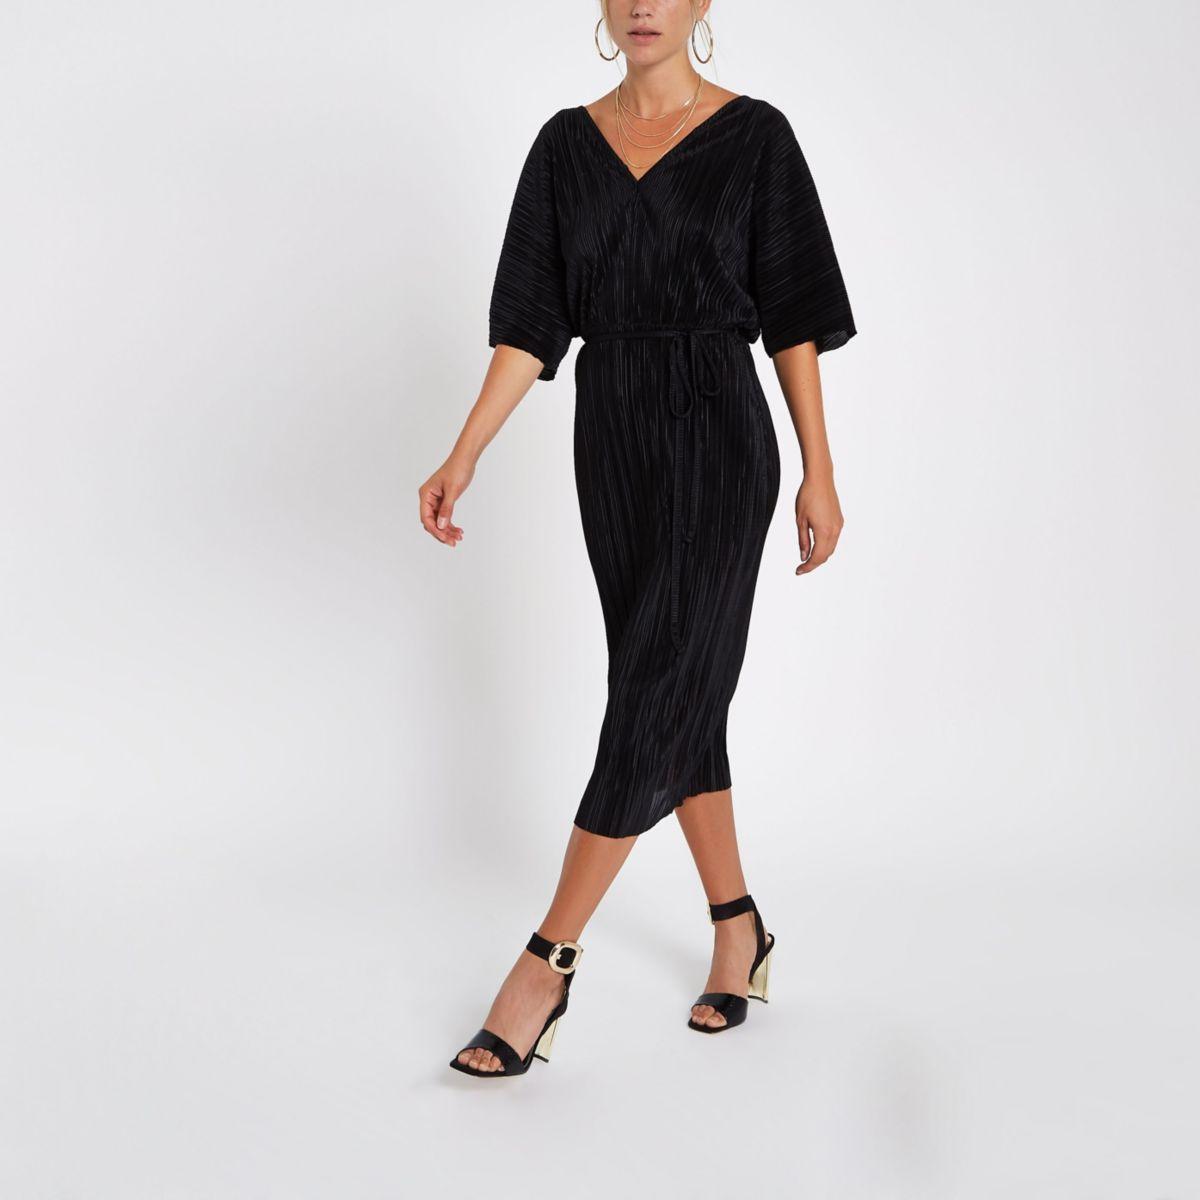 Black plisse V neck midi dress